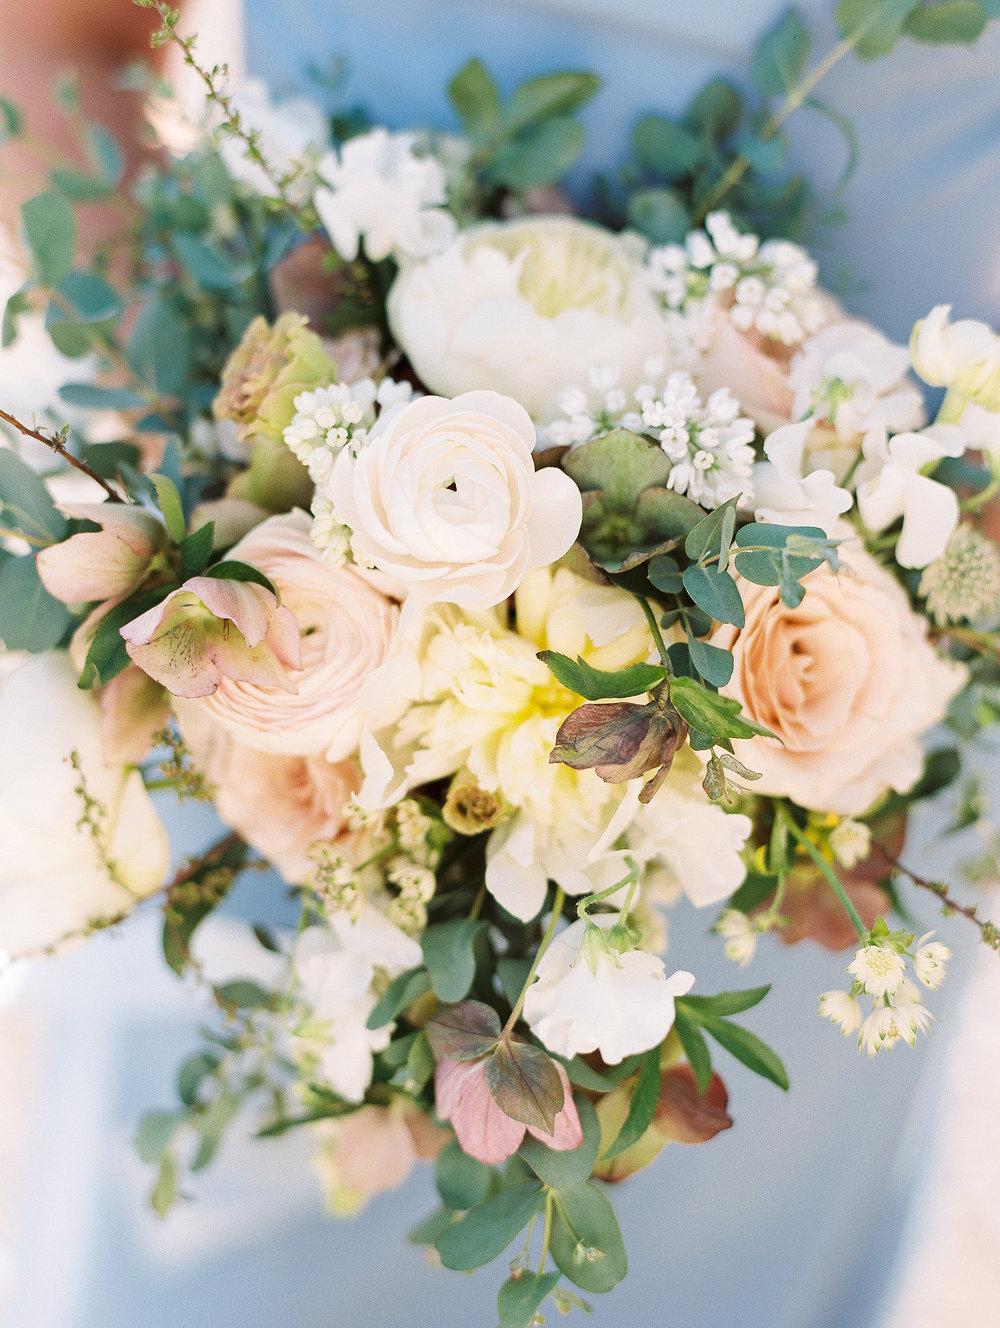 jessica-zimmerman-events-bridesmaid-bouquet-peach-blue.jpg